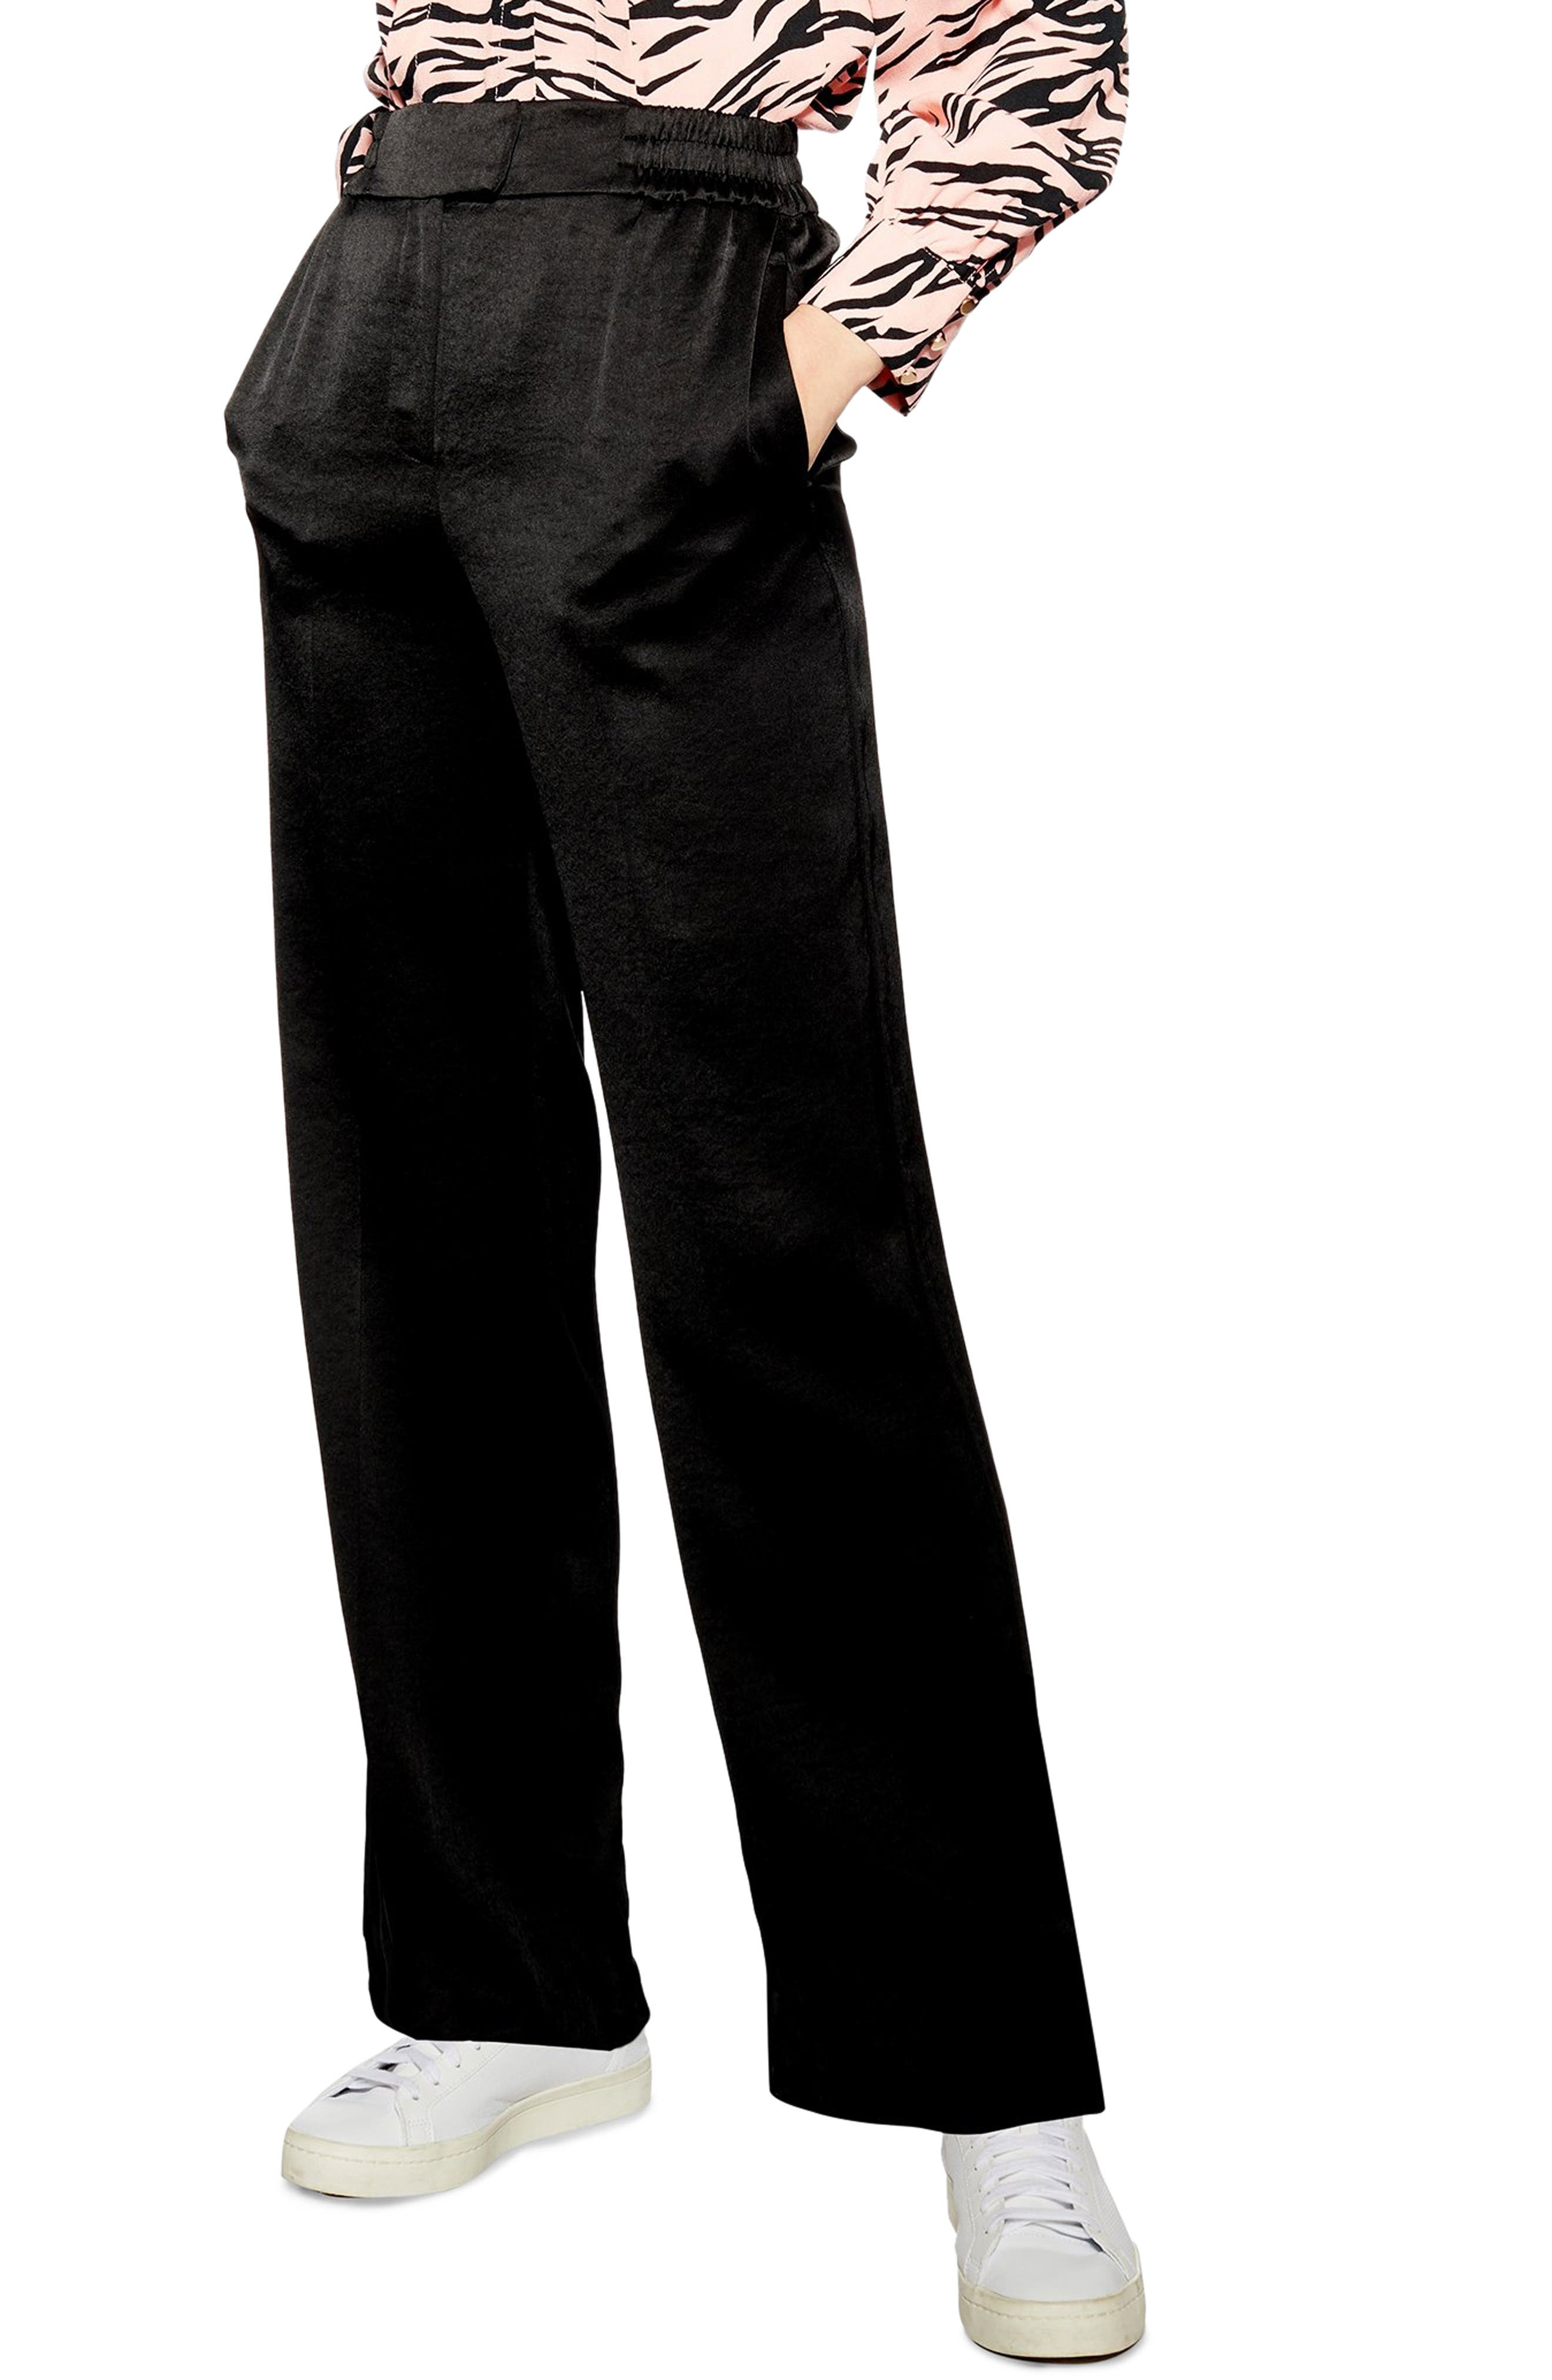 TOPSHOP, Elastic Satin Trousers, Main thumbnail 1, color, 001